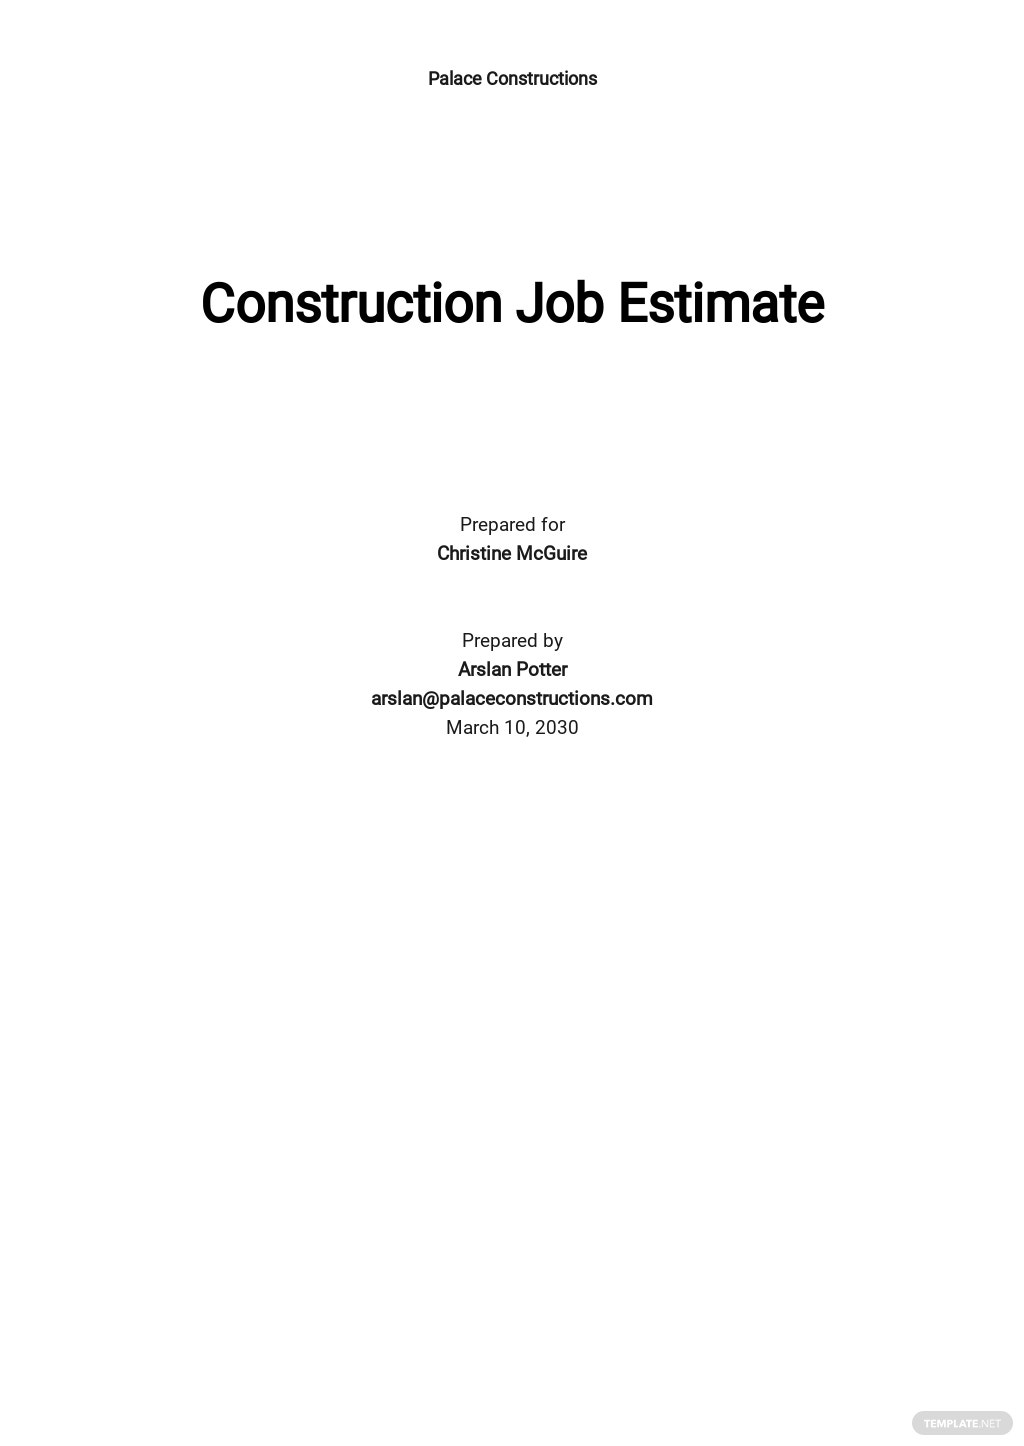 Construction Job Estimate Template